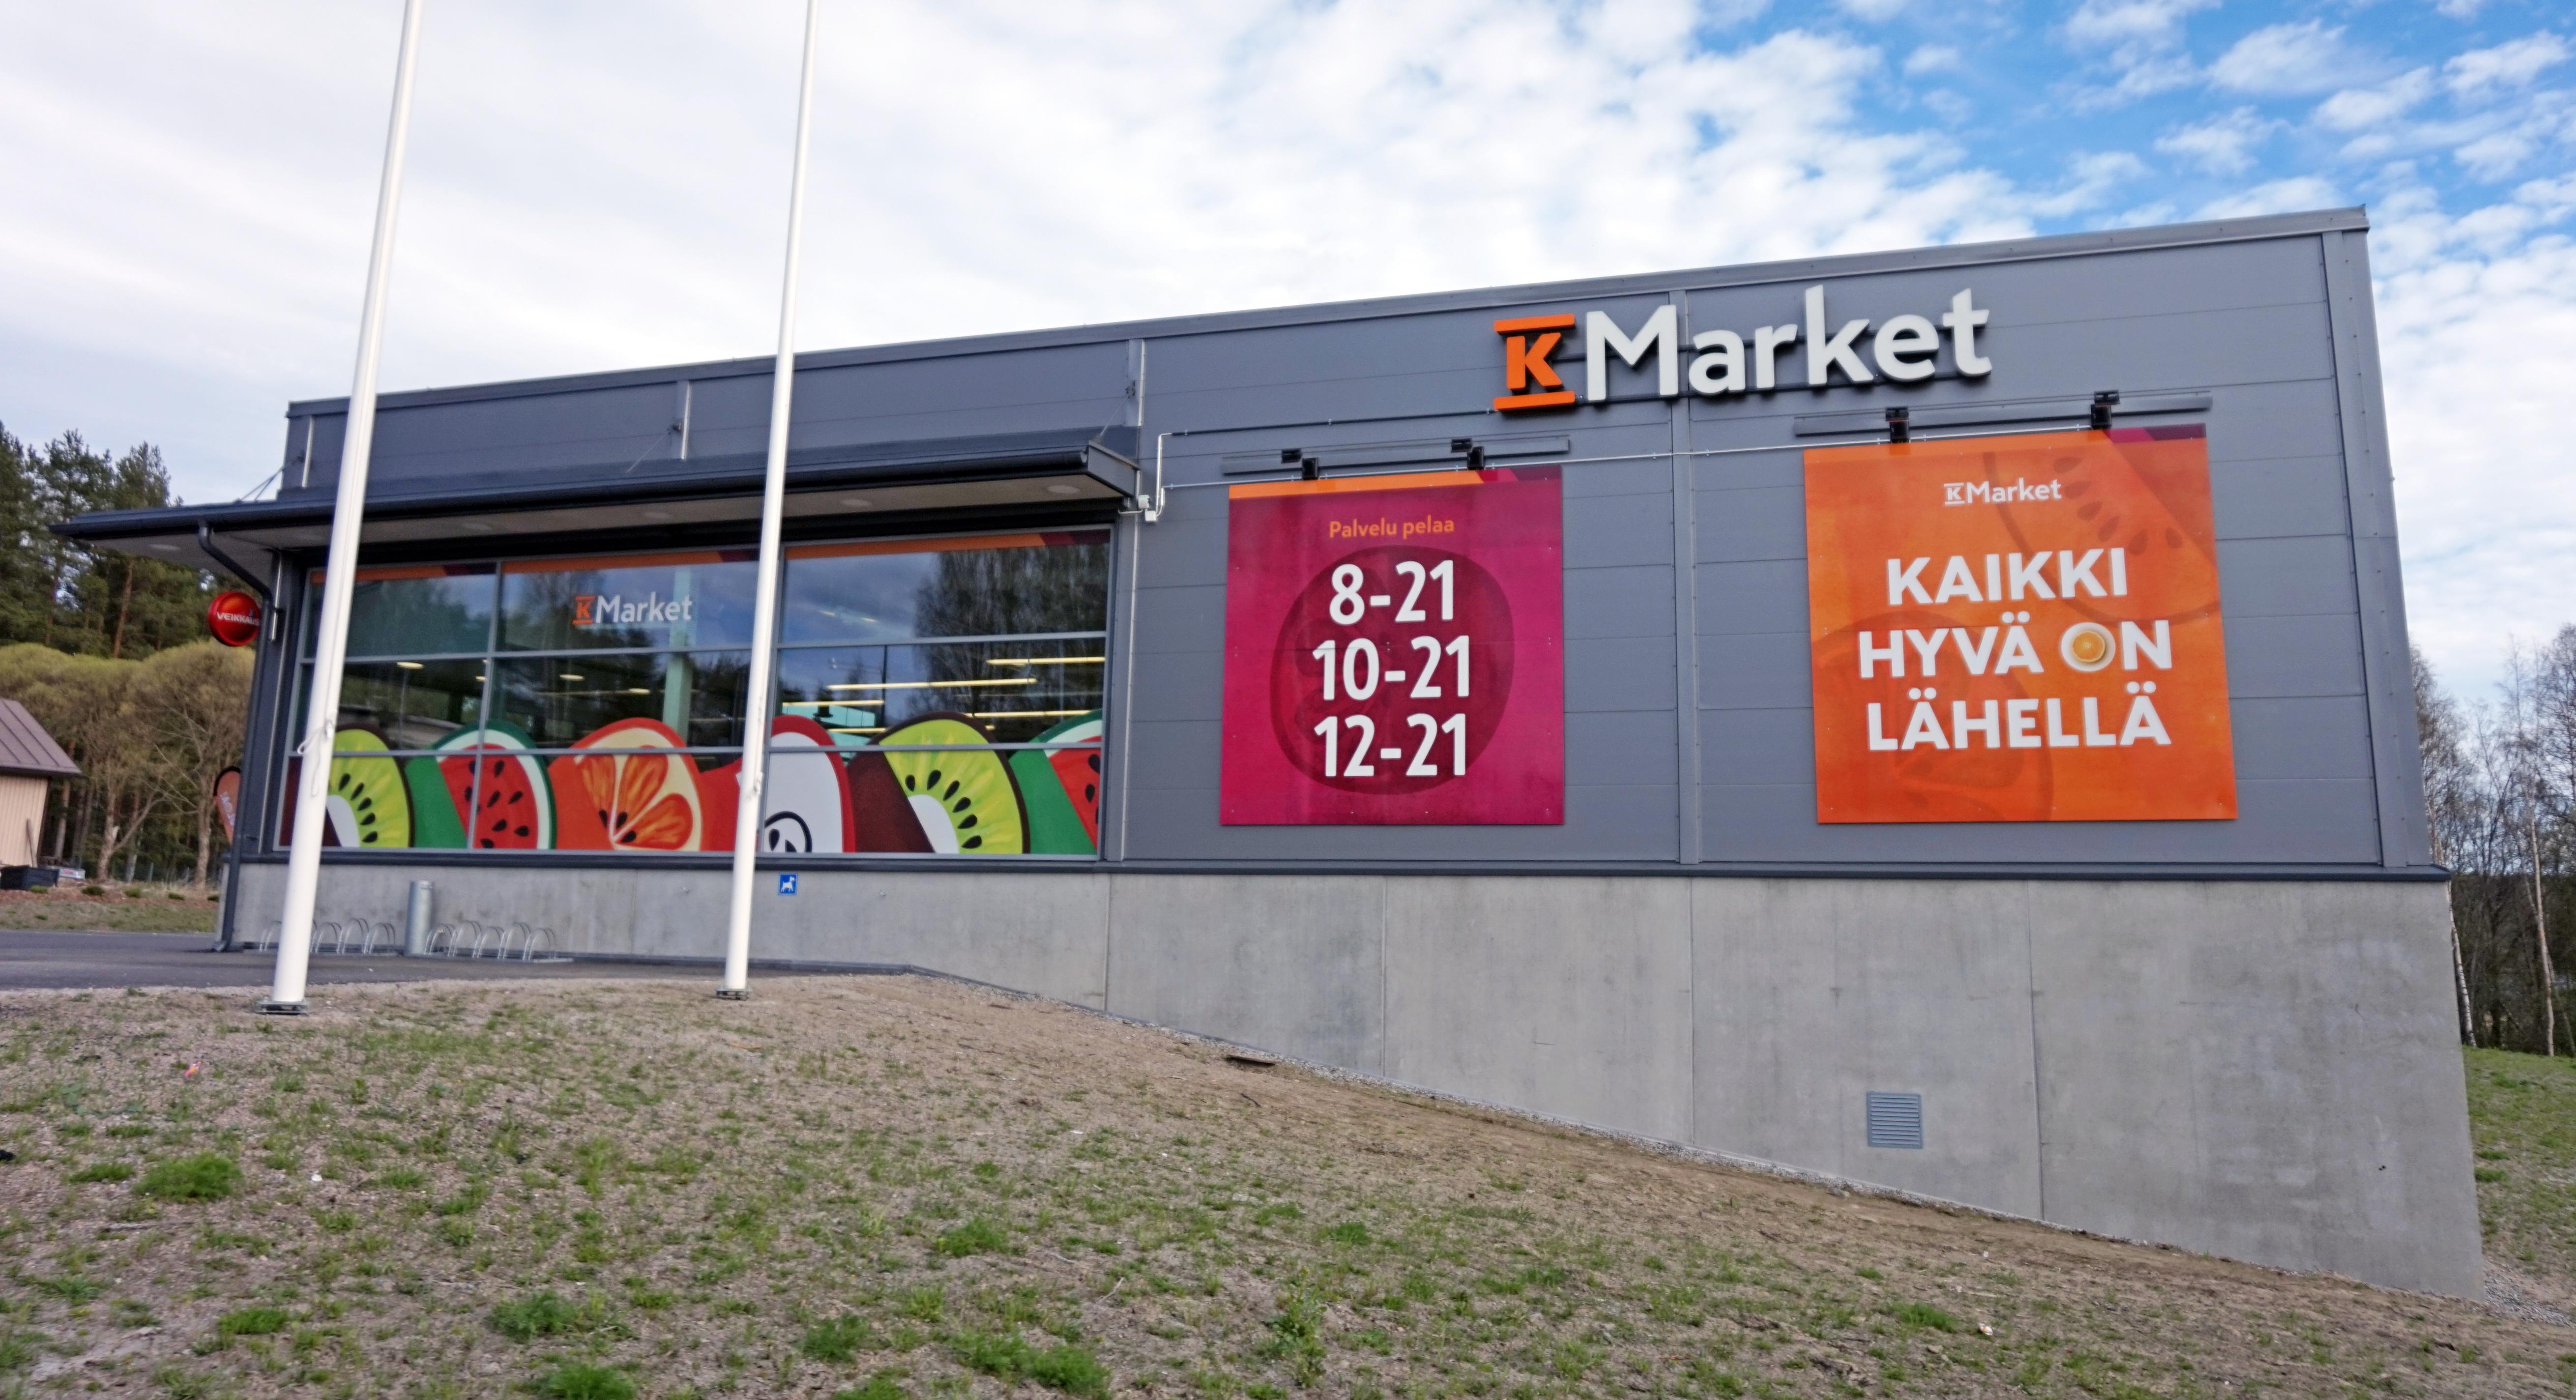 K Market Sipulikatu